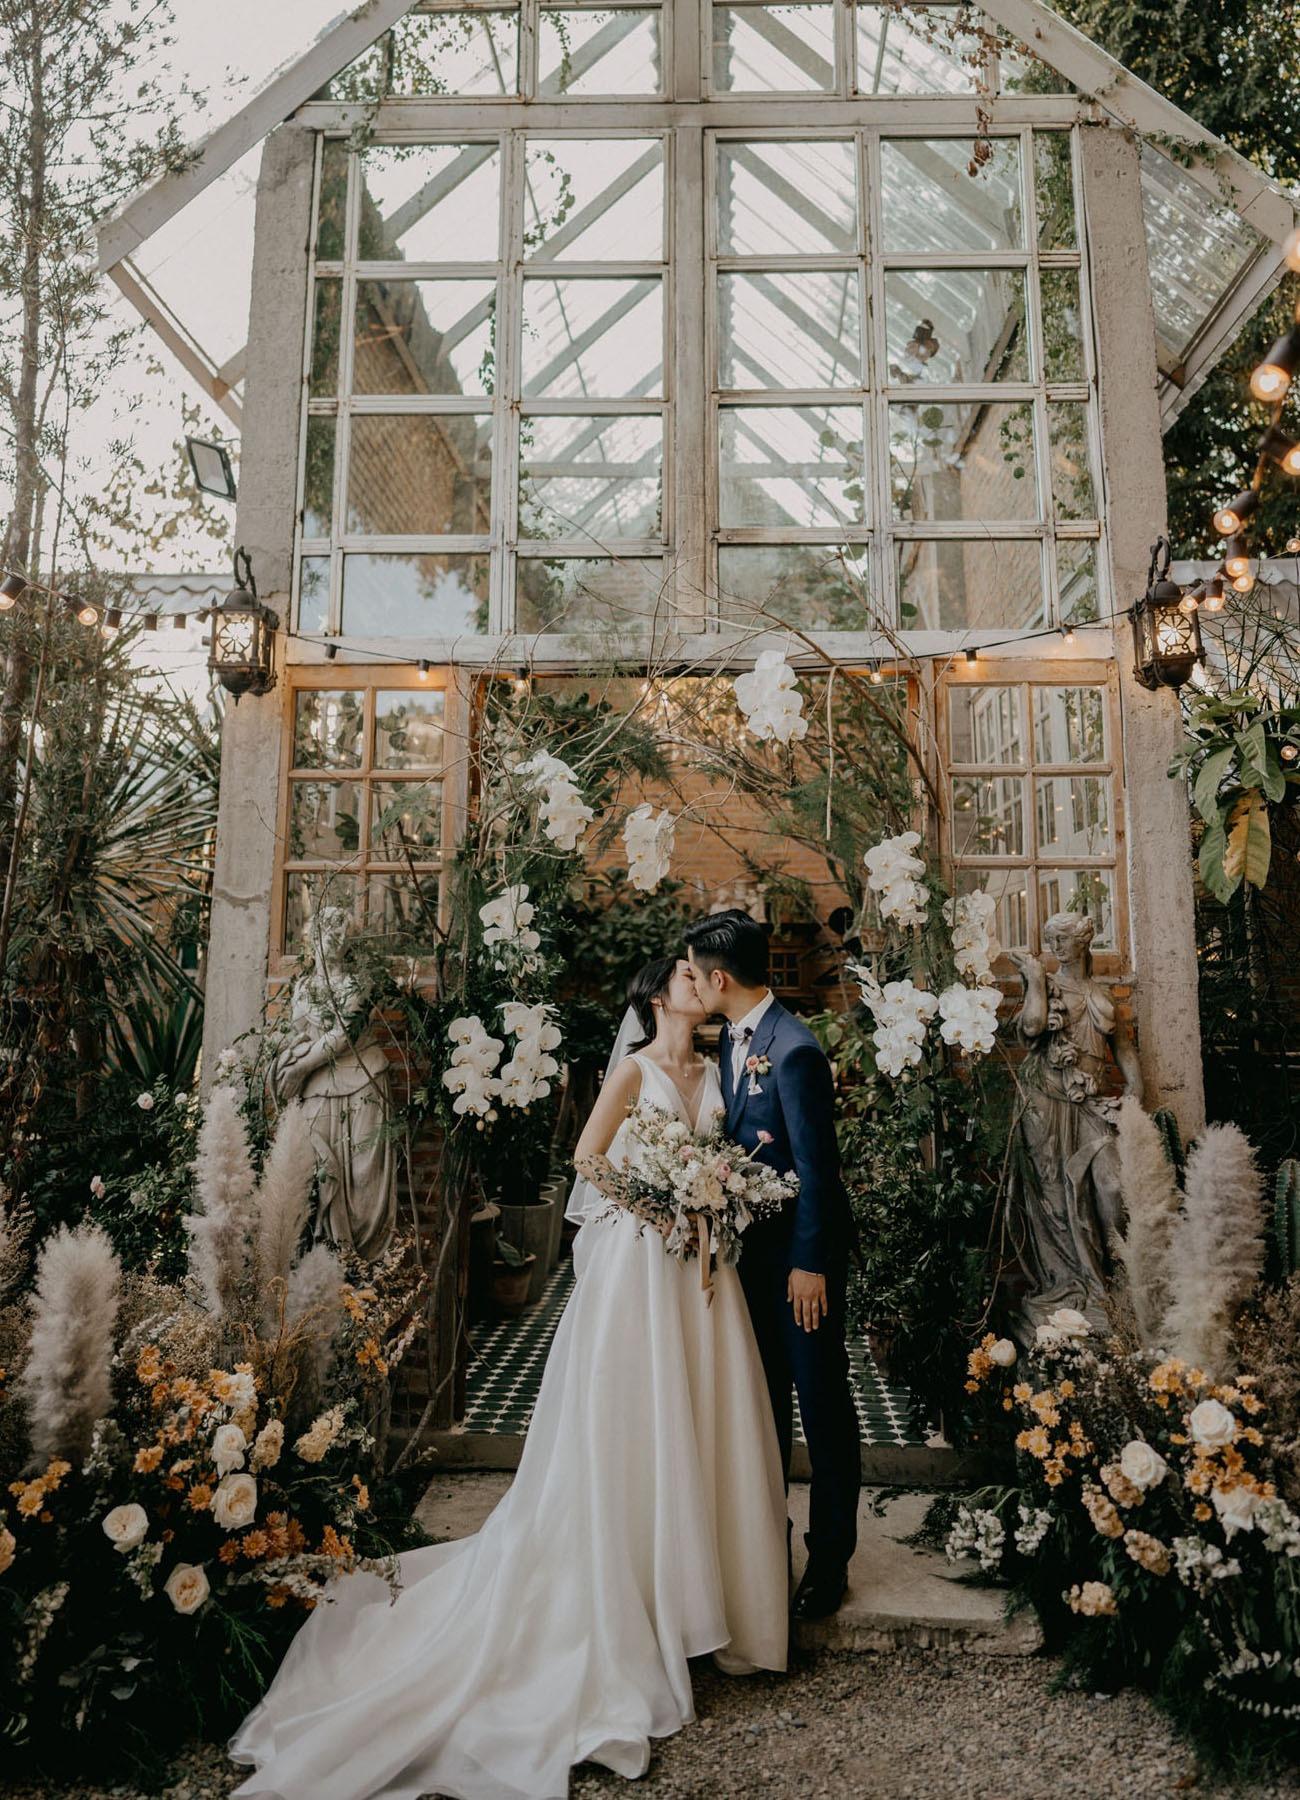 Thailand glass house ceremony destination wedding idea